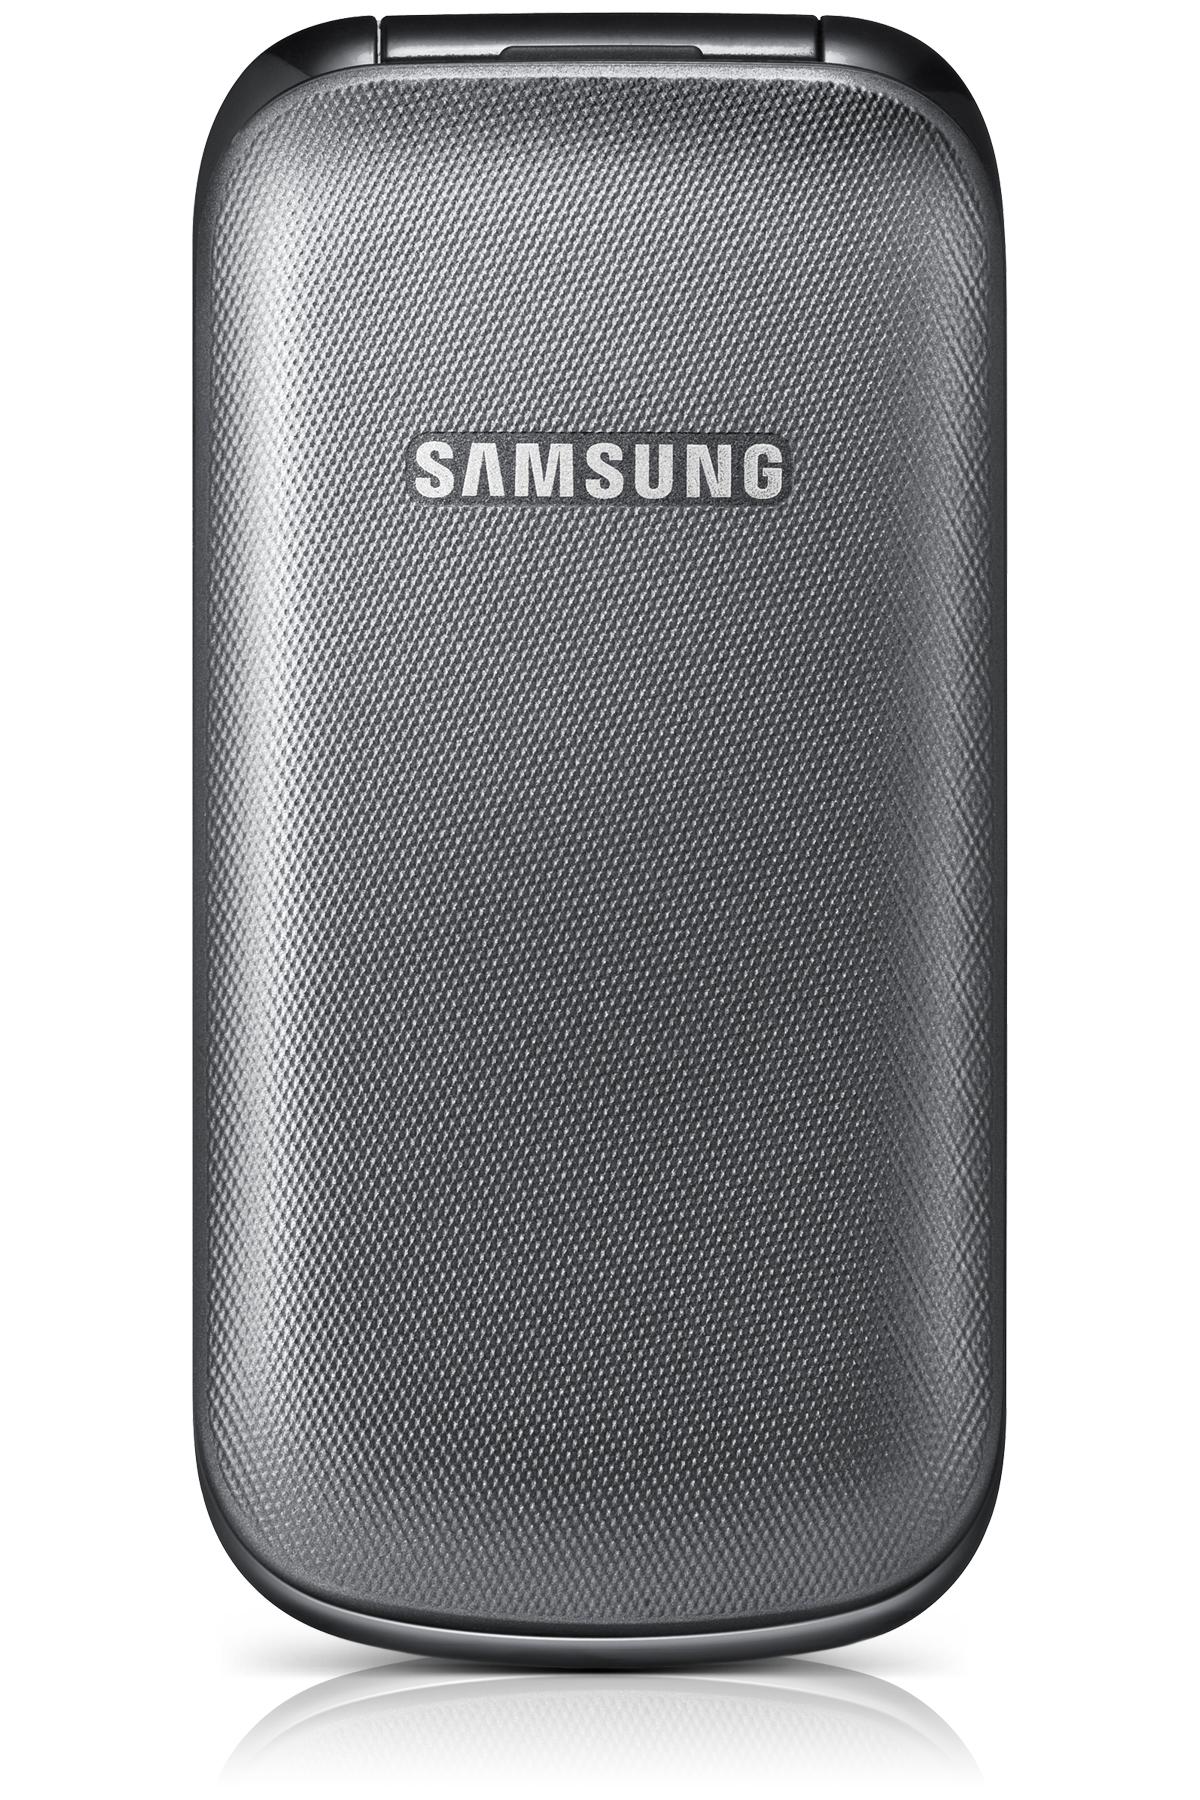 SAMSUNG Flip CDMA Phone Seri E1195